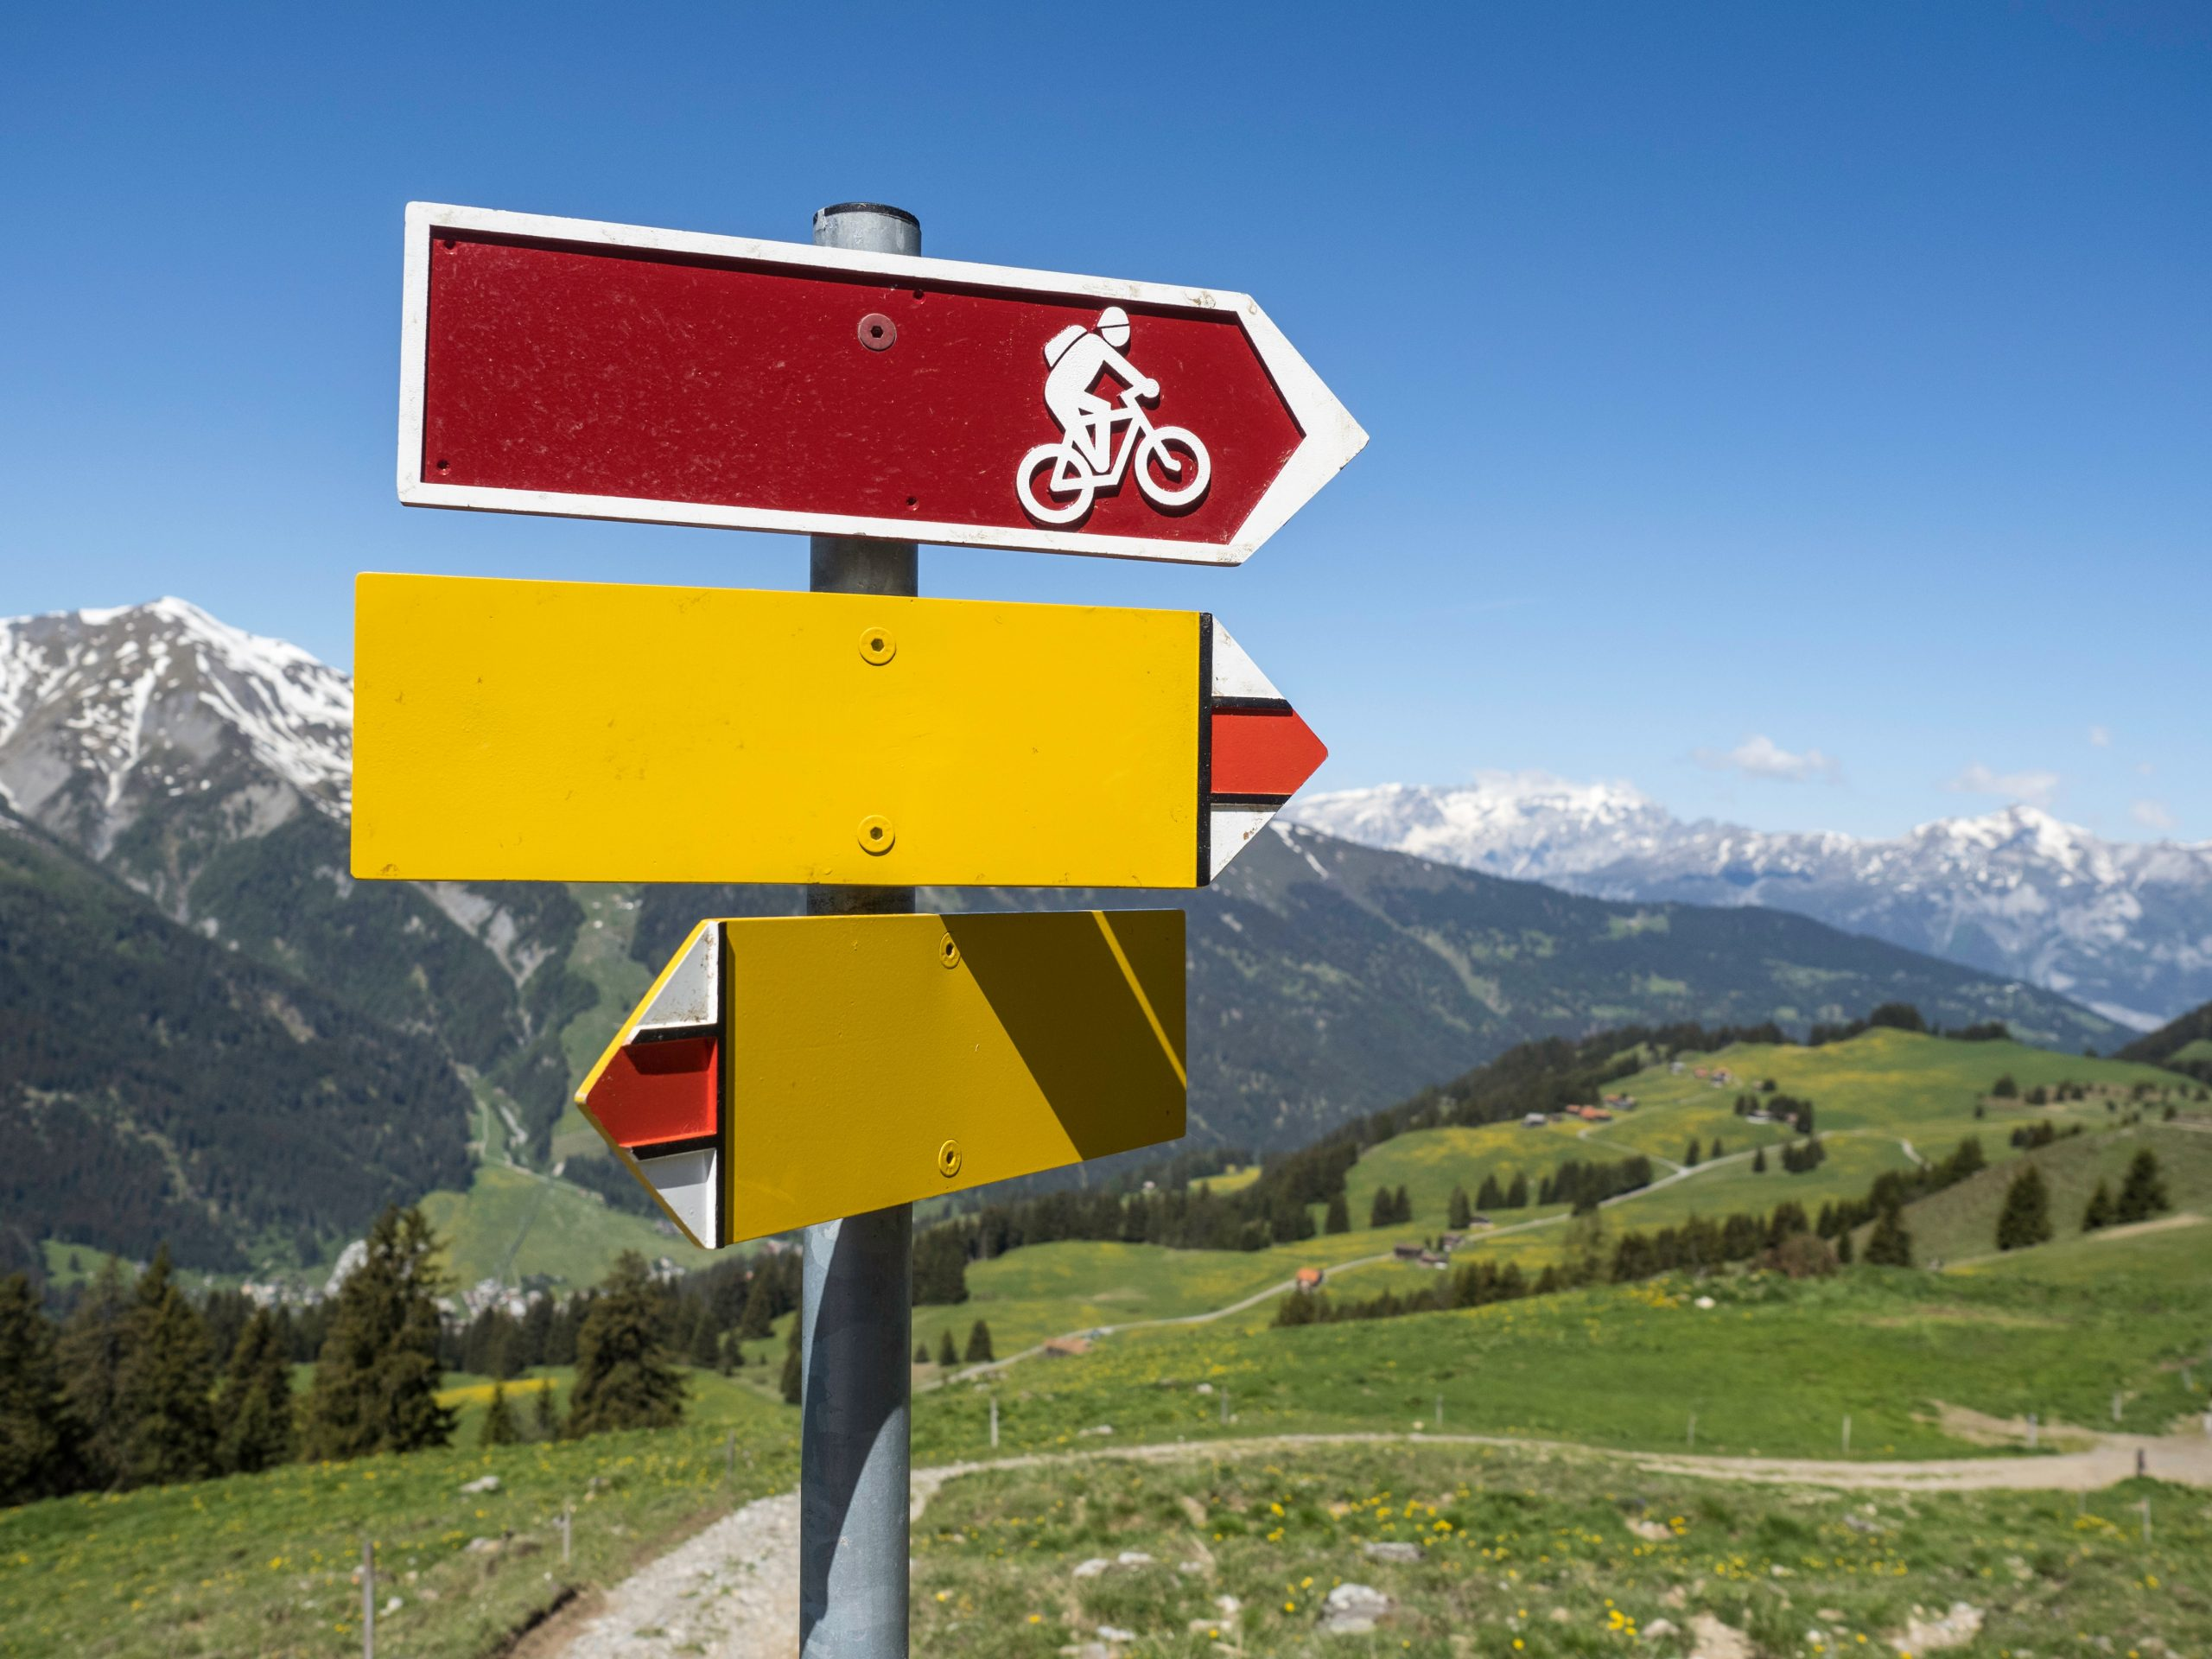 Ciclismo.